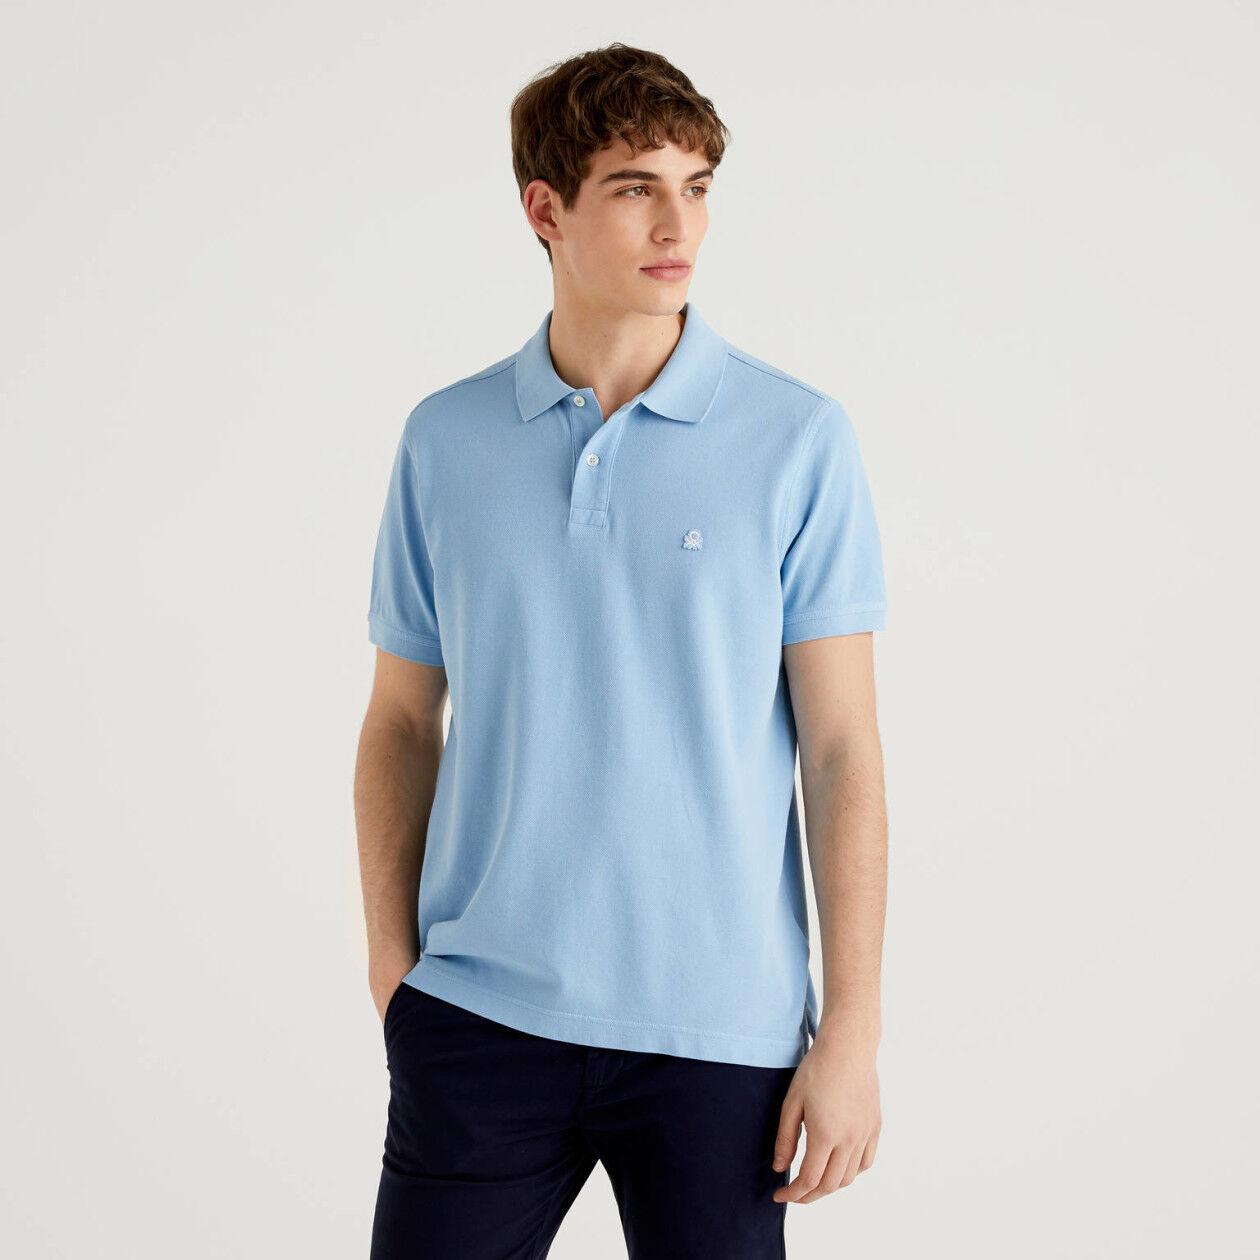 Light blue regular fit polo